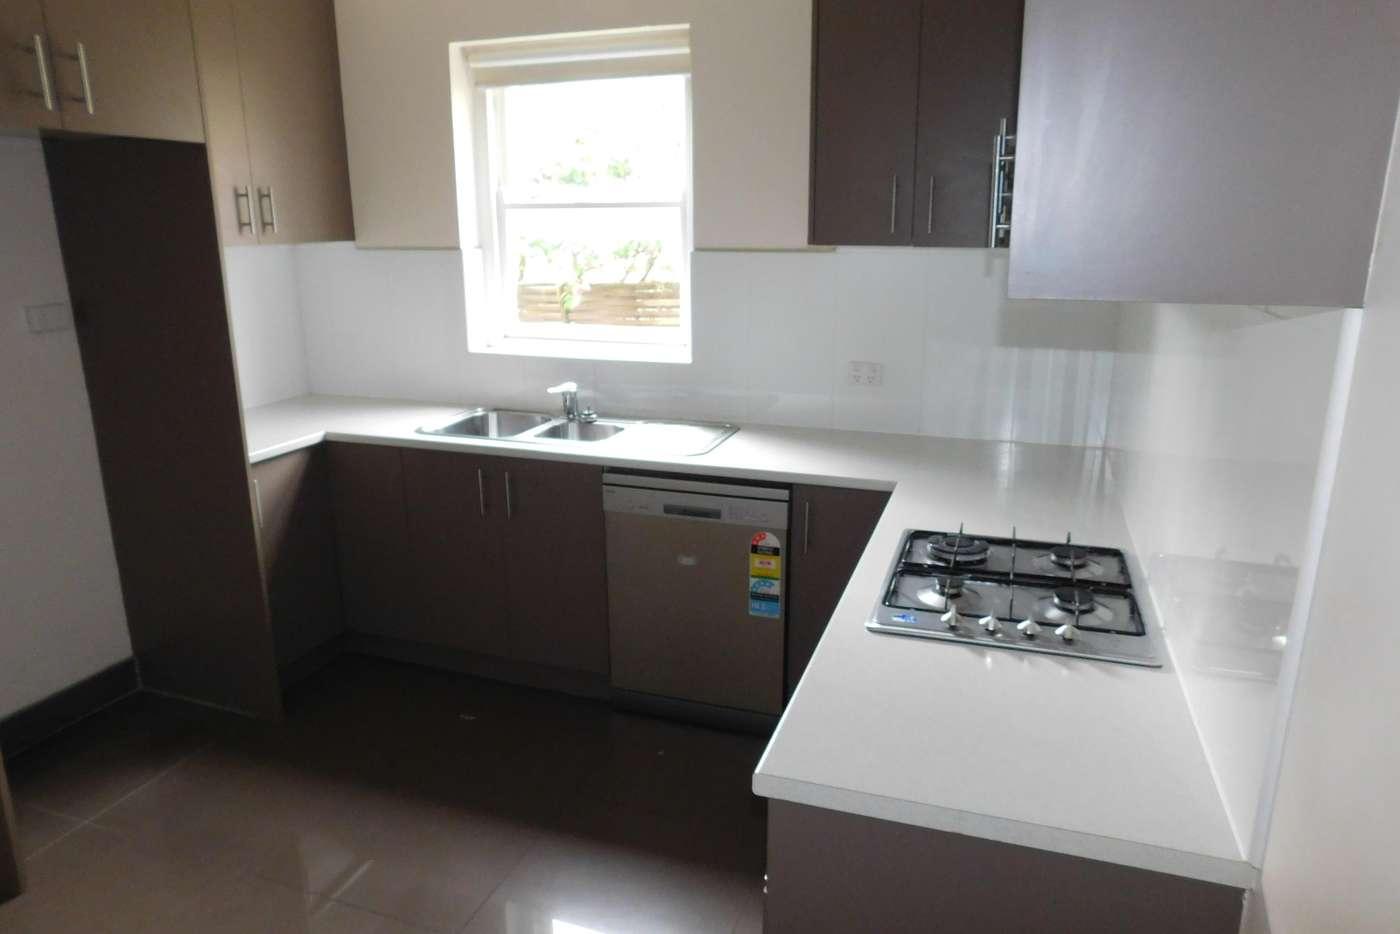 Sixth view of Homely house listing, 62 Kangaroo Road, Murrumbeena VIC 3163